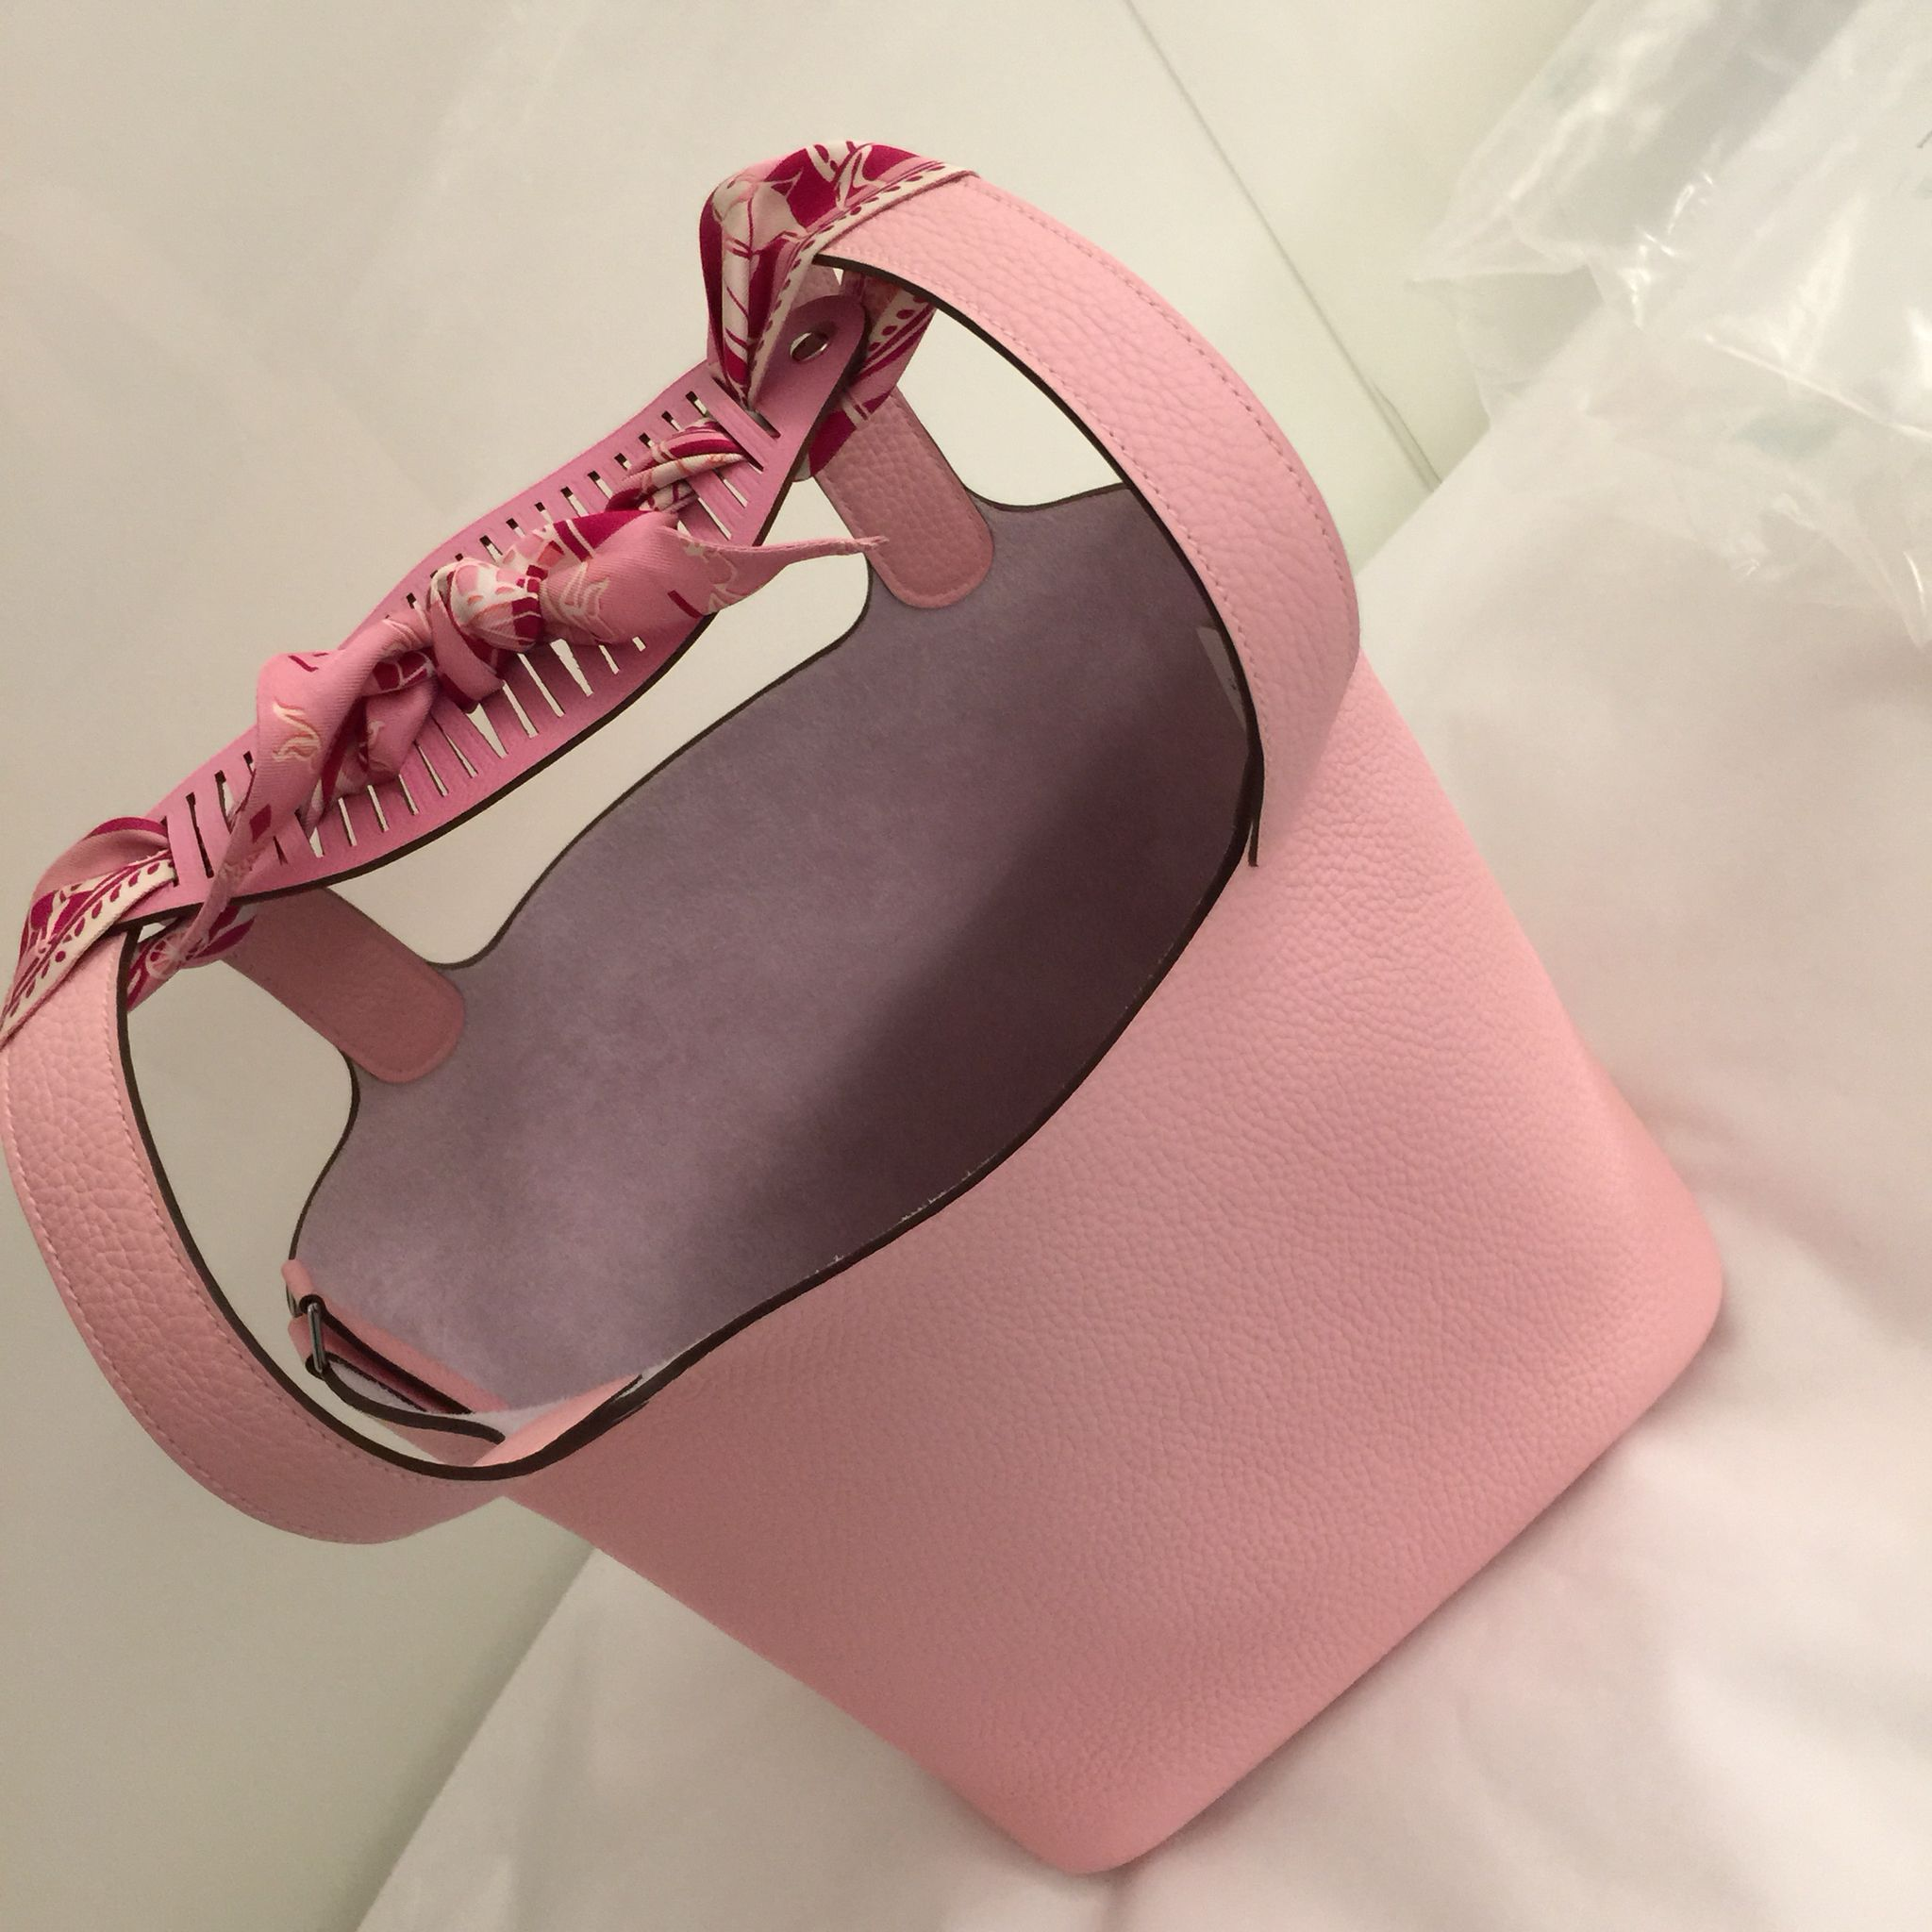 Hermes Picotin Lock 22 Rose Sakura With T Pe H Bracelet In Pink Turn Into A Shoulder Bag